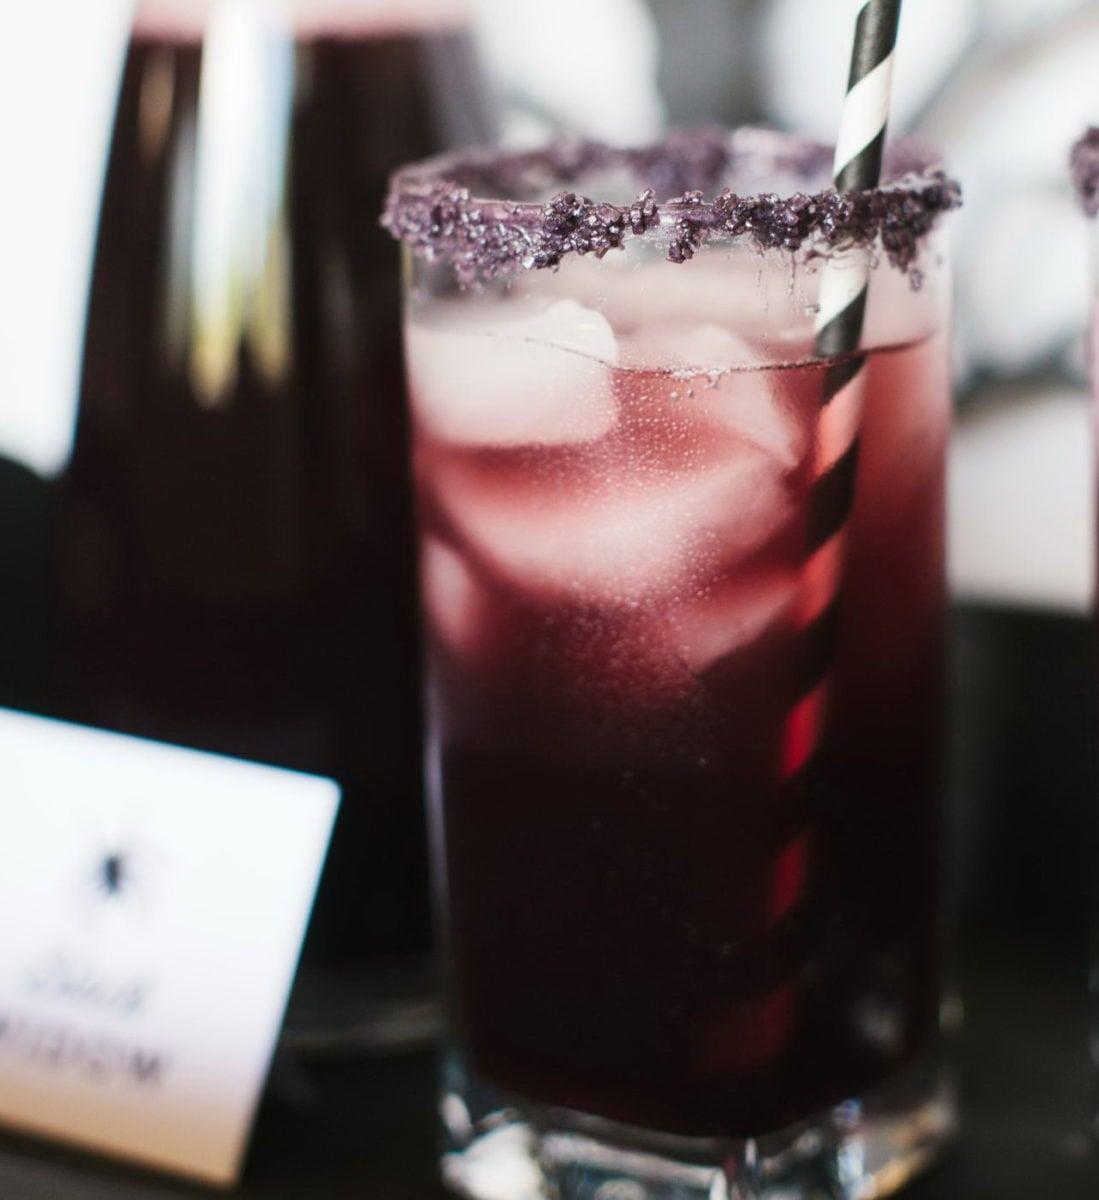 CI-Rennai-Hoefer_Halloween-cocktail-black-widow-close_v.jpg.rend.hgtvcom.1280.1707